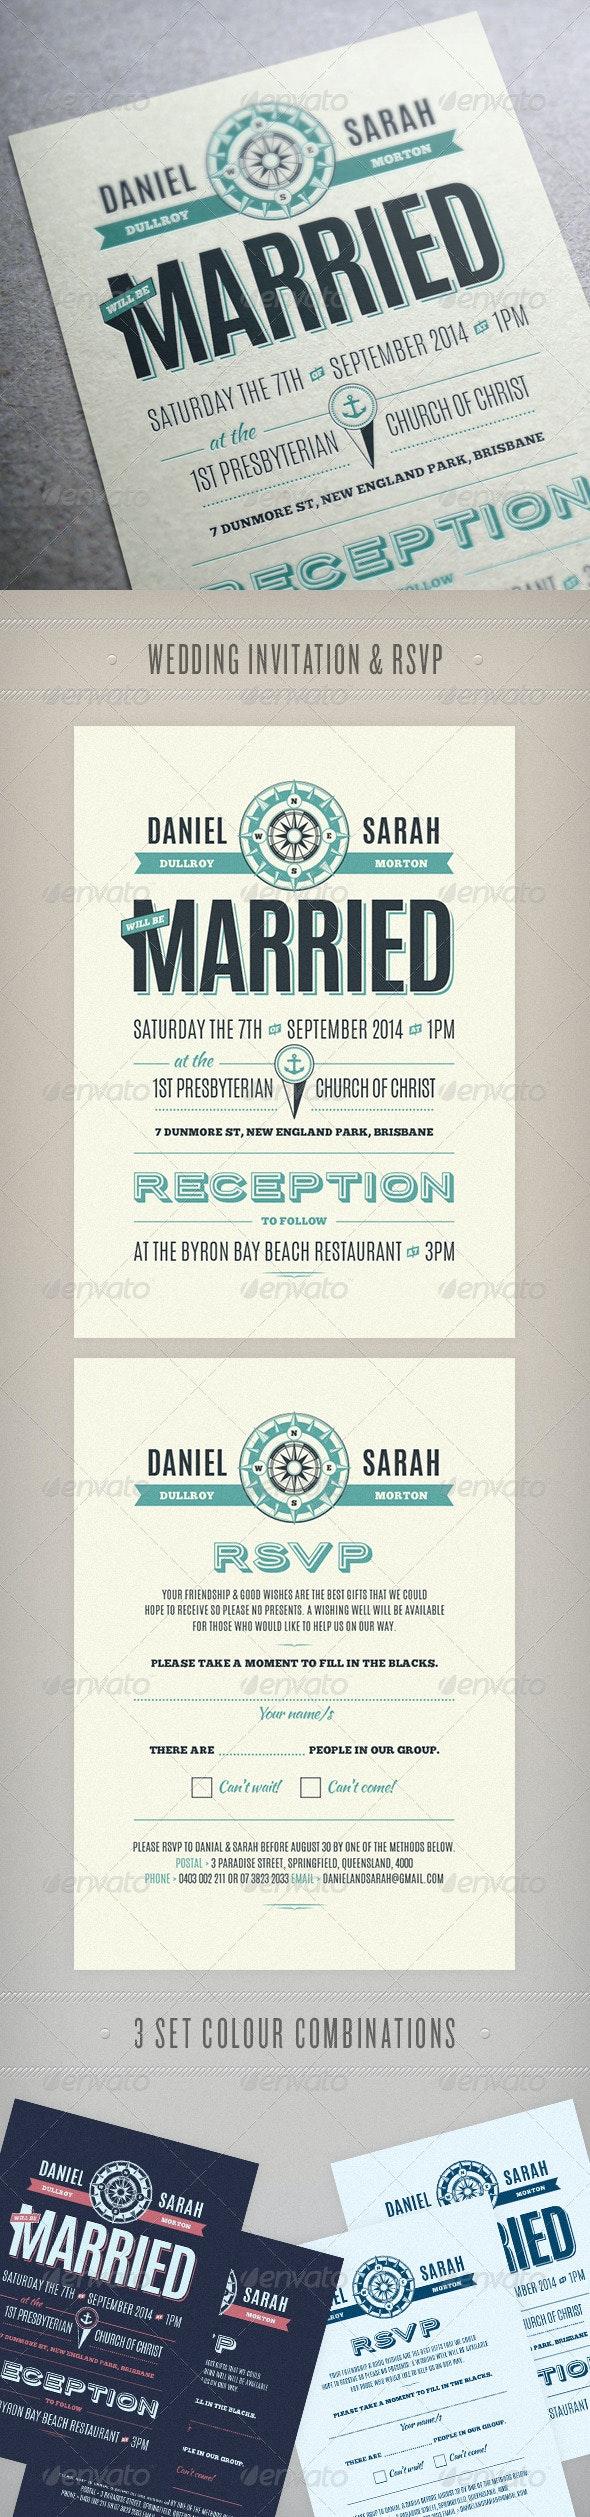 Nautical Wedding Invite - Weddings Cards & Invites